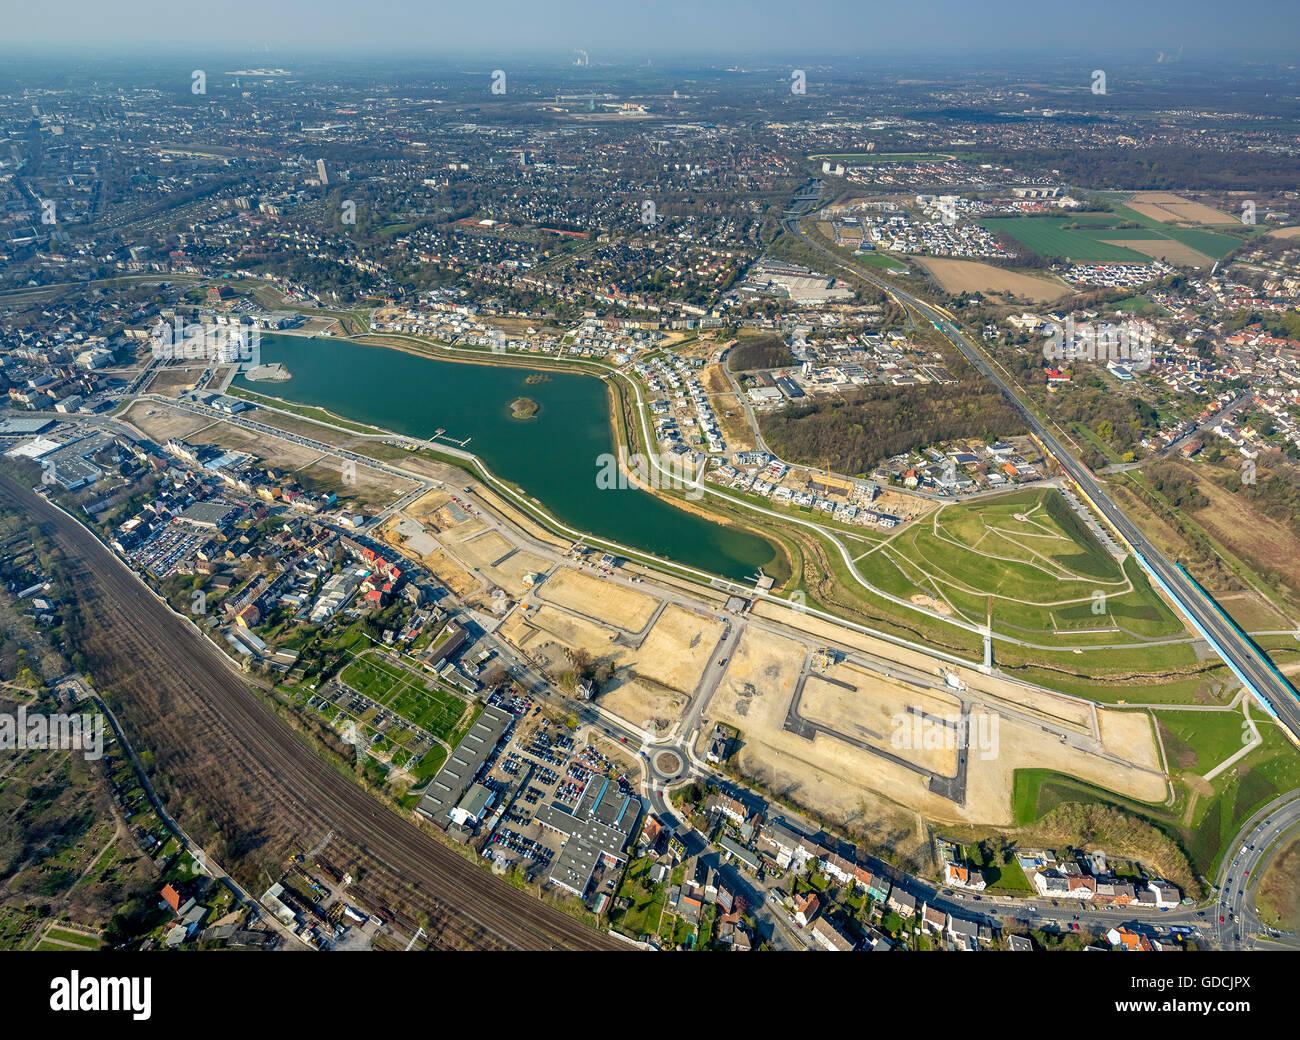 Aerial view, Phoenix Lake Dortmund with adjoining building, Dortmund, Ruhr aeria, north rhine-westphalia, Germany, Stock Photo